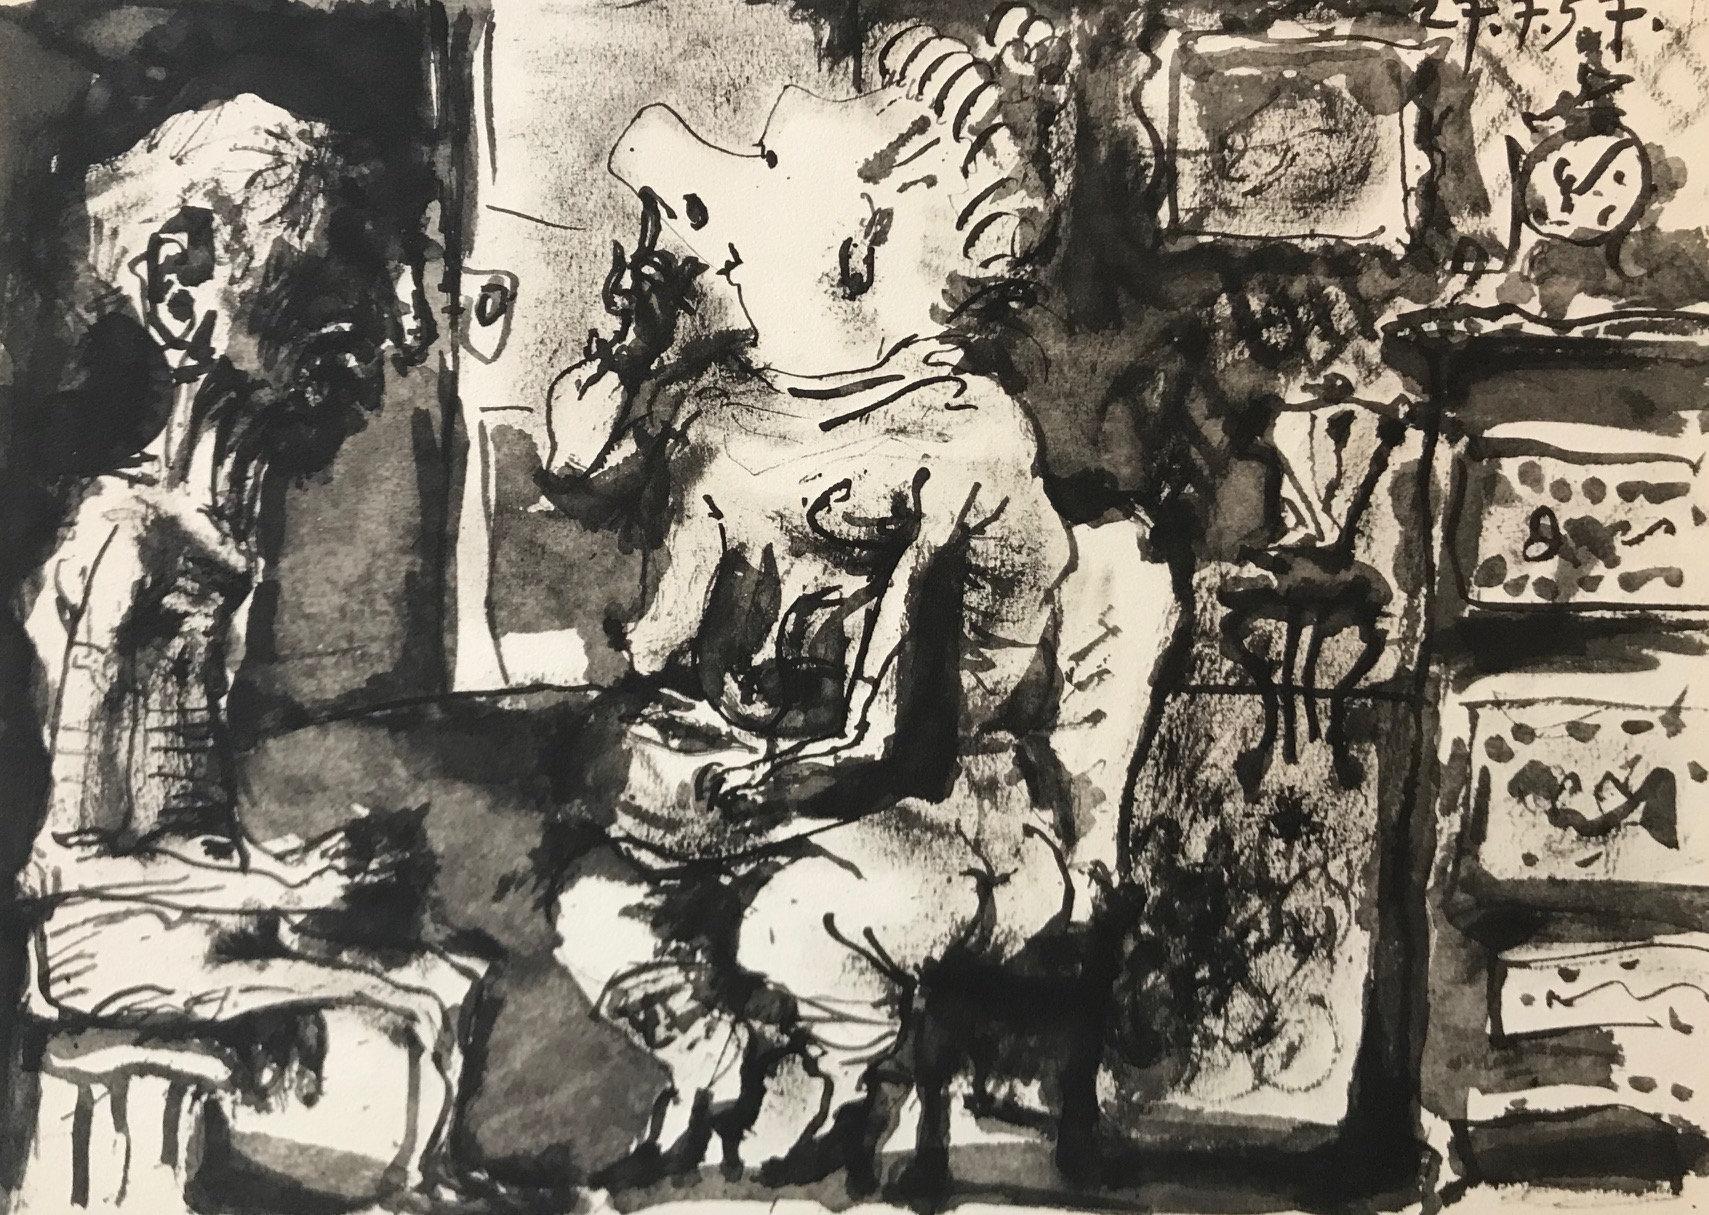 Picasso Toros Y Toreros, dated 27/7/59